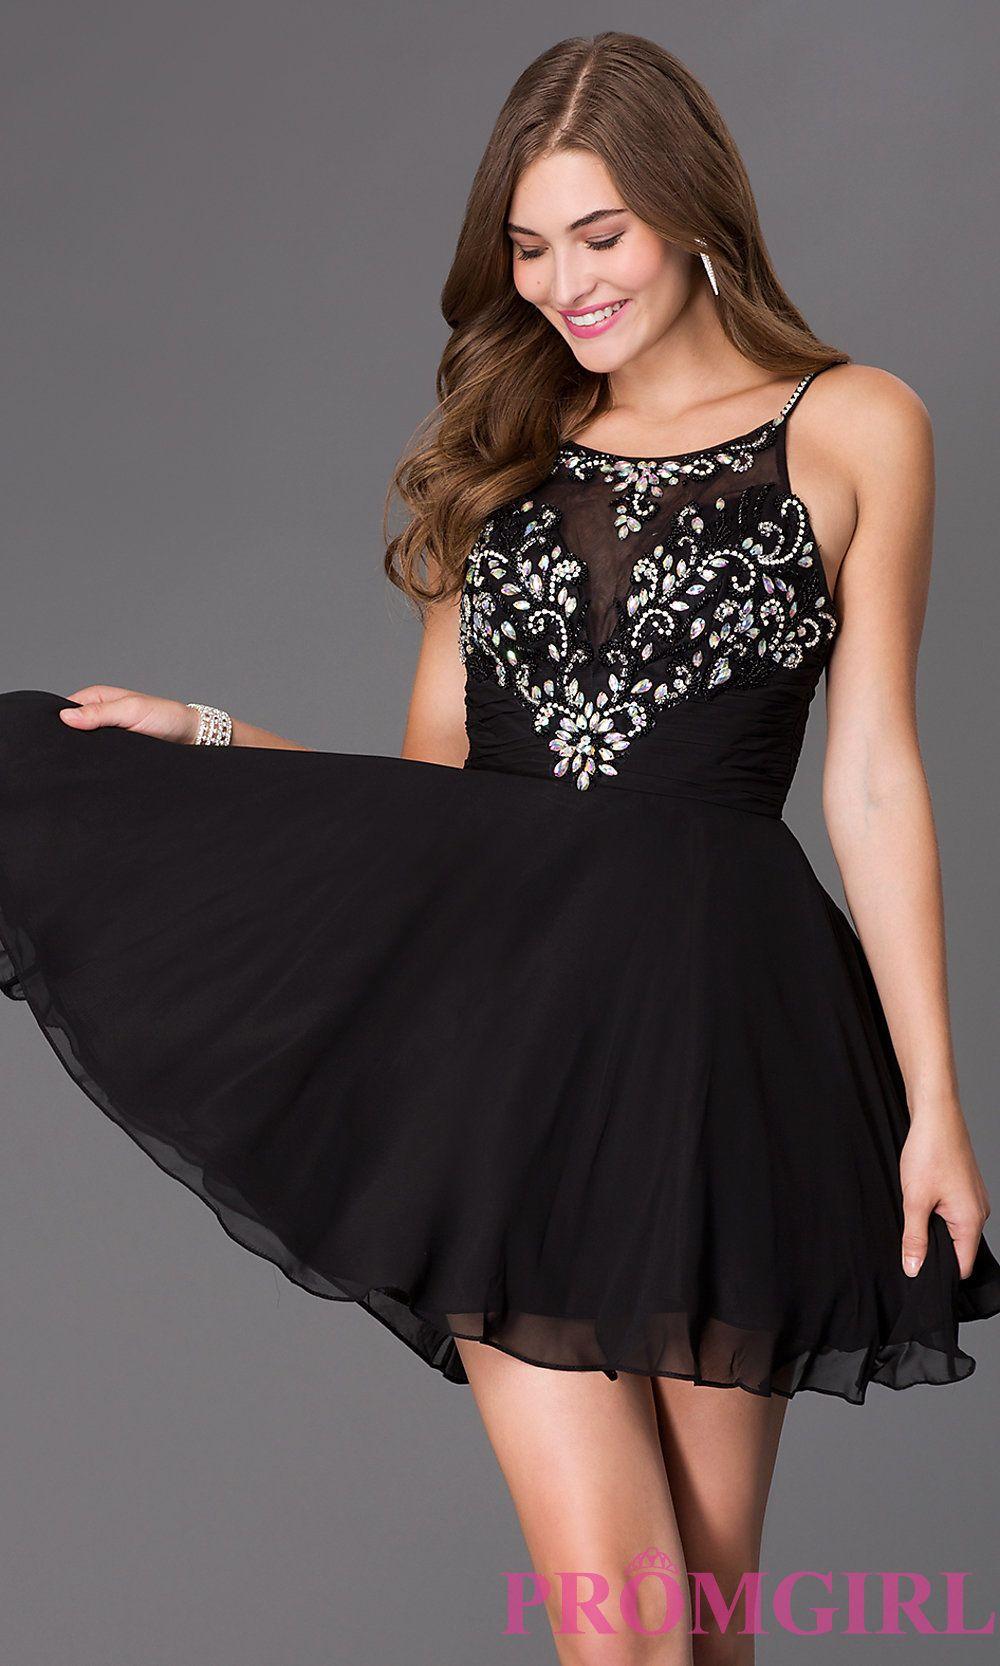 Black Homecoming Dresses | HERMOSAS MUJERES | Pinterest ...